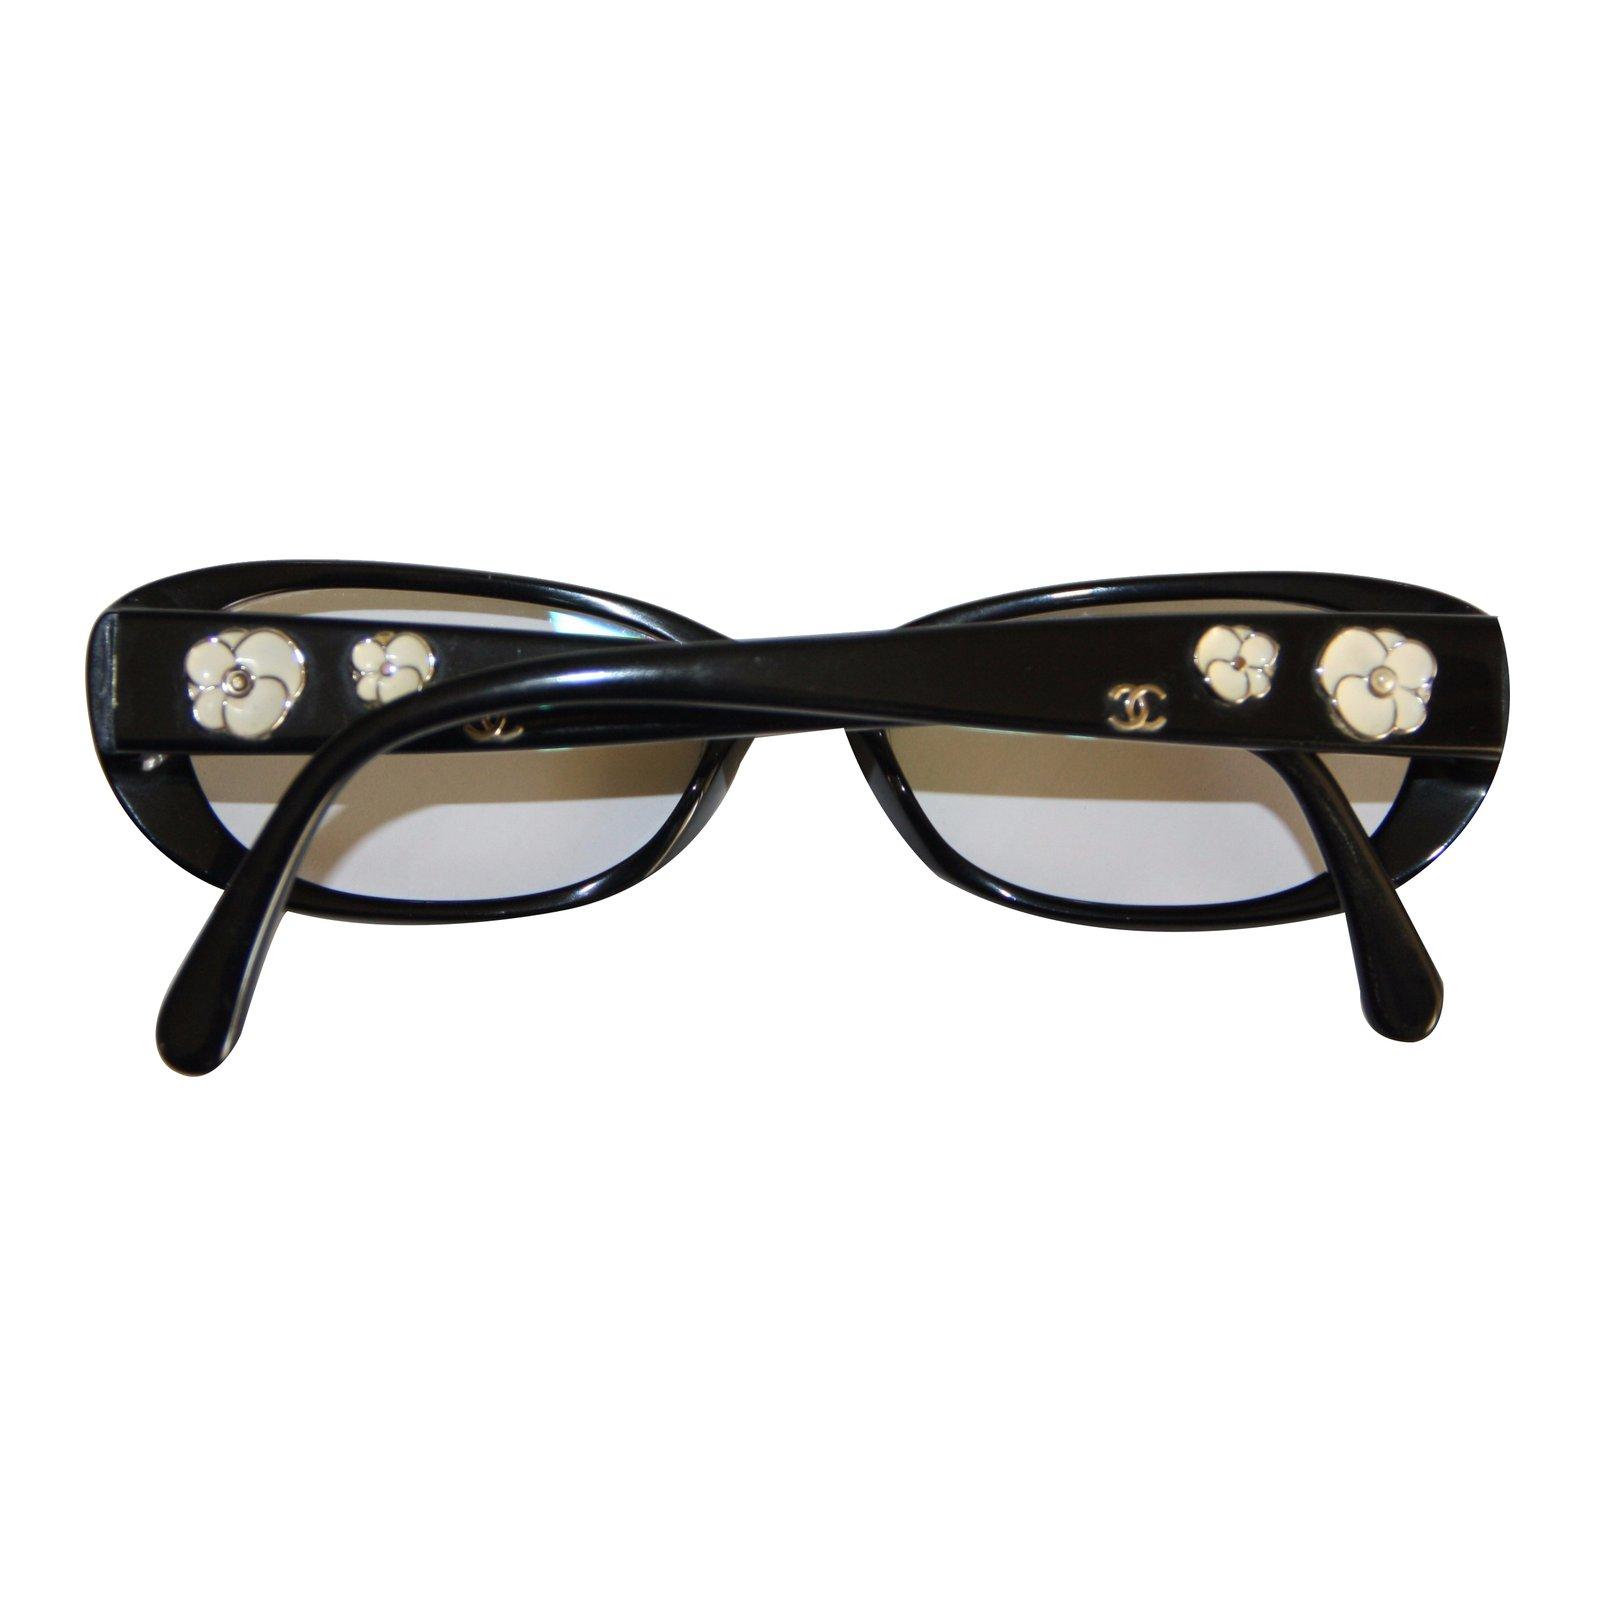 Reading Glasses Sunglasses  chanel chanel reading glasses sunglasses plastic black white ref